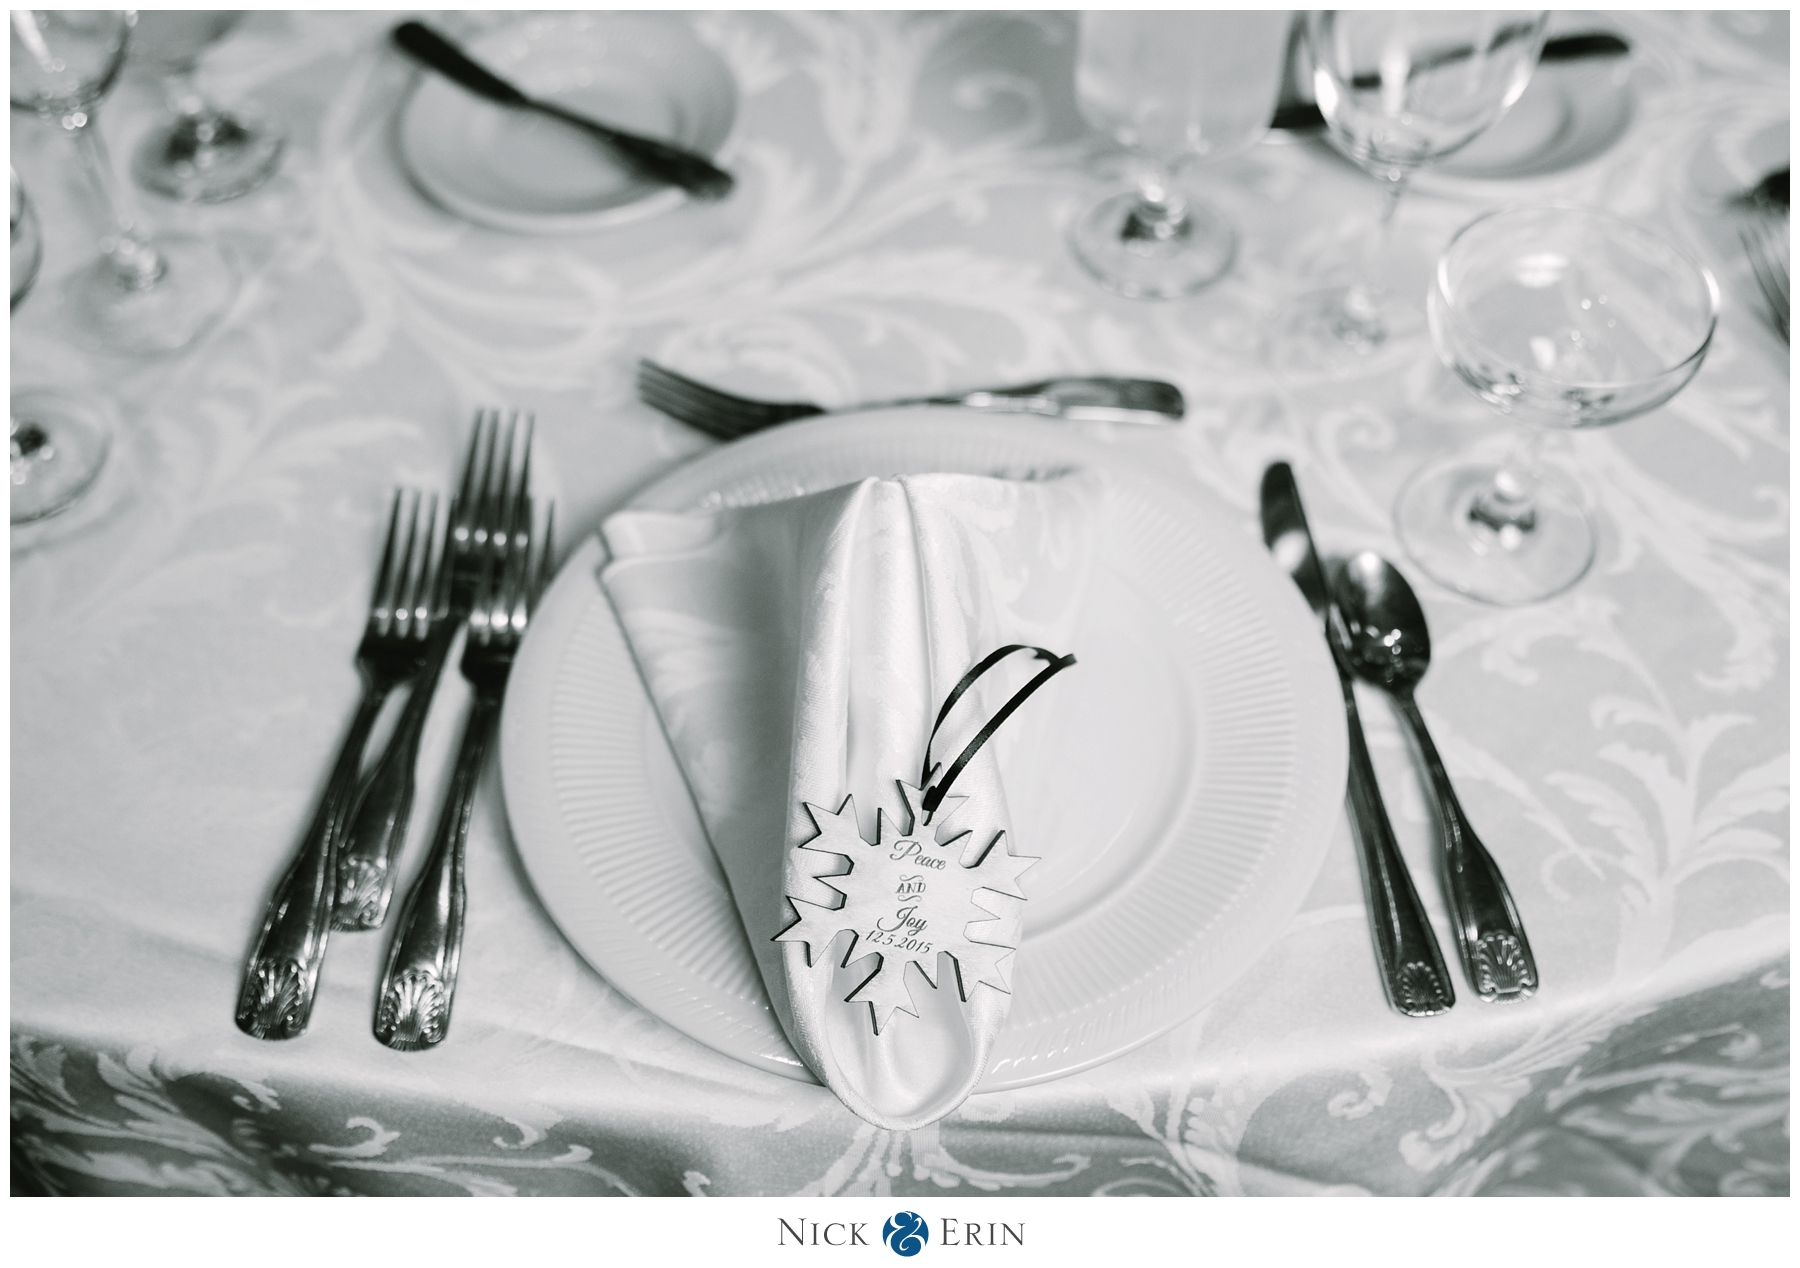 Donner_Photography_Mendenhall Inn Wedding_Blake & Kristina_0035